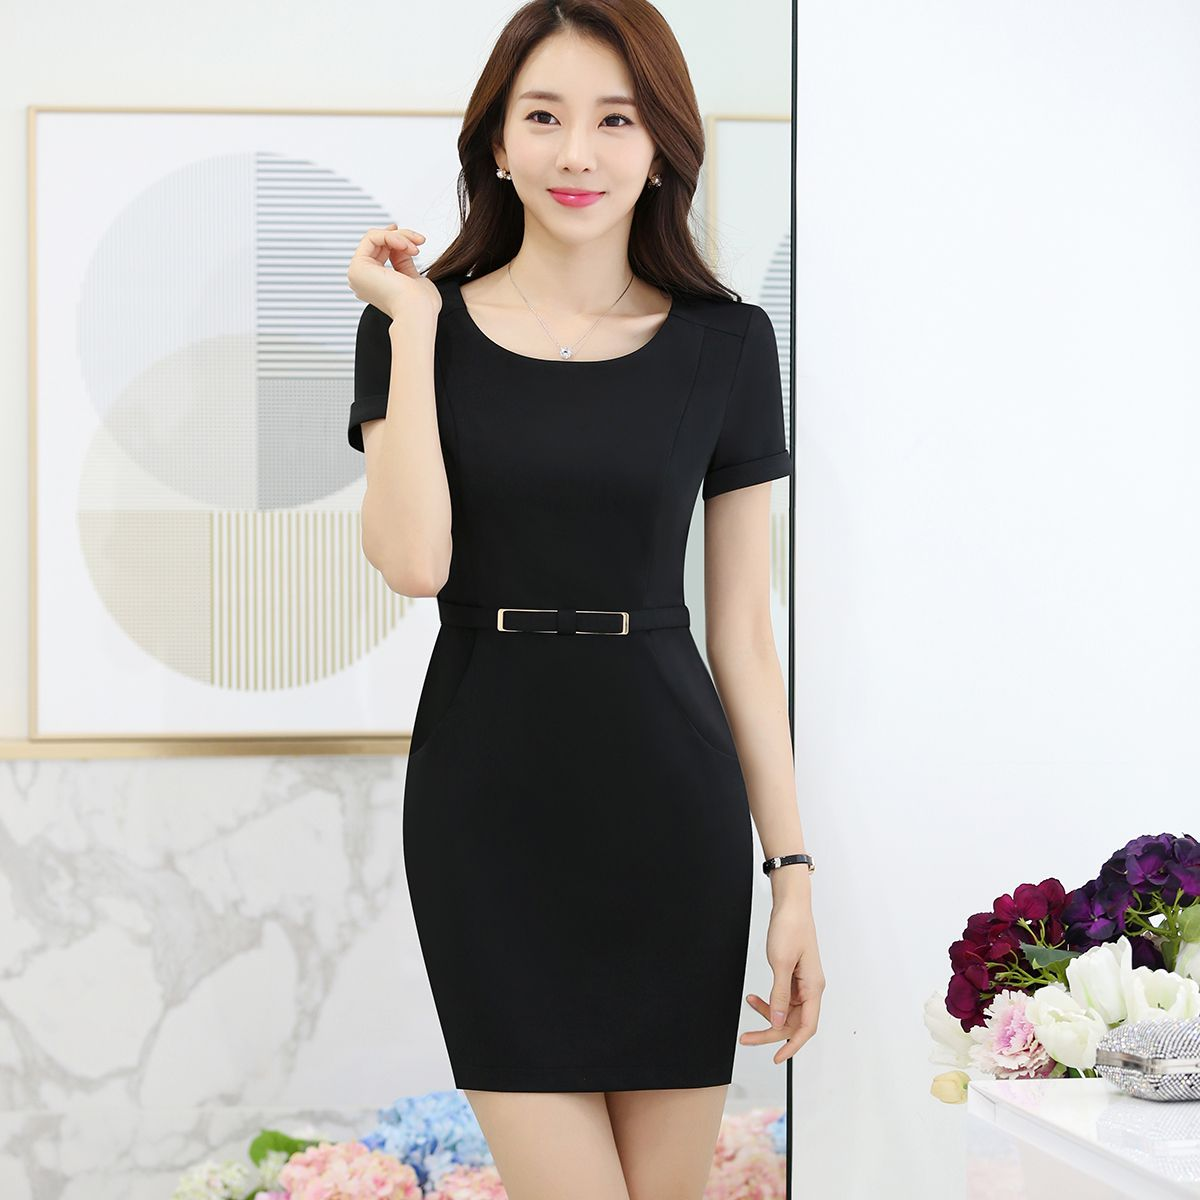 2017 New Summer Work Women dress Short Sleeve O-Neck Slim Career Long Pockets Hip Dresses Lavender Black 6639